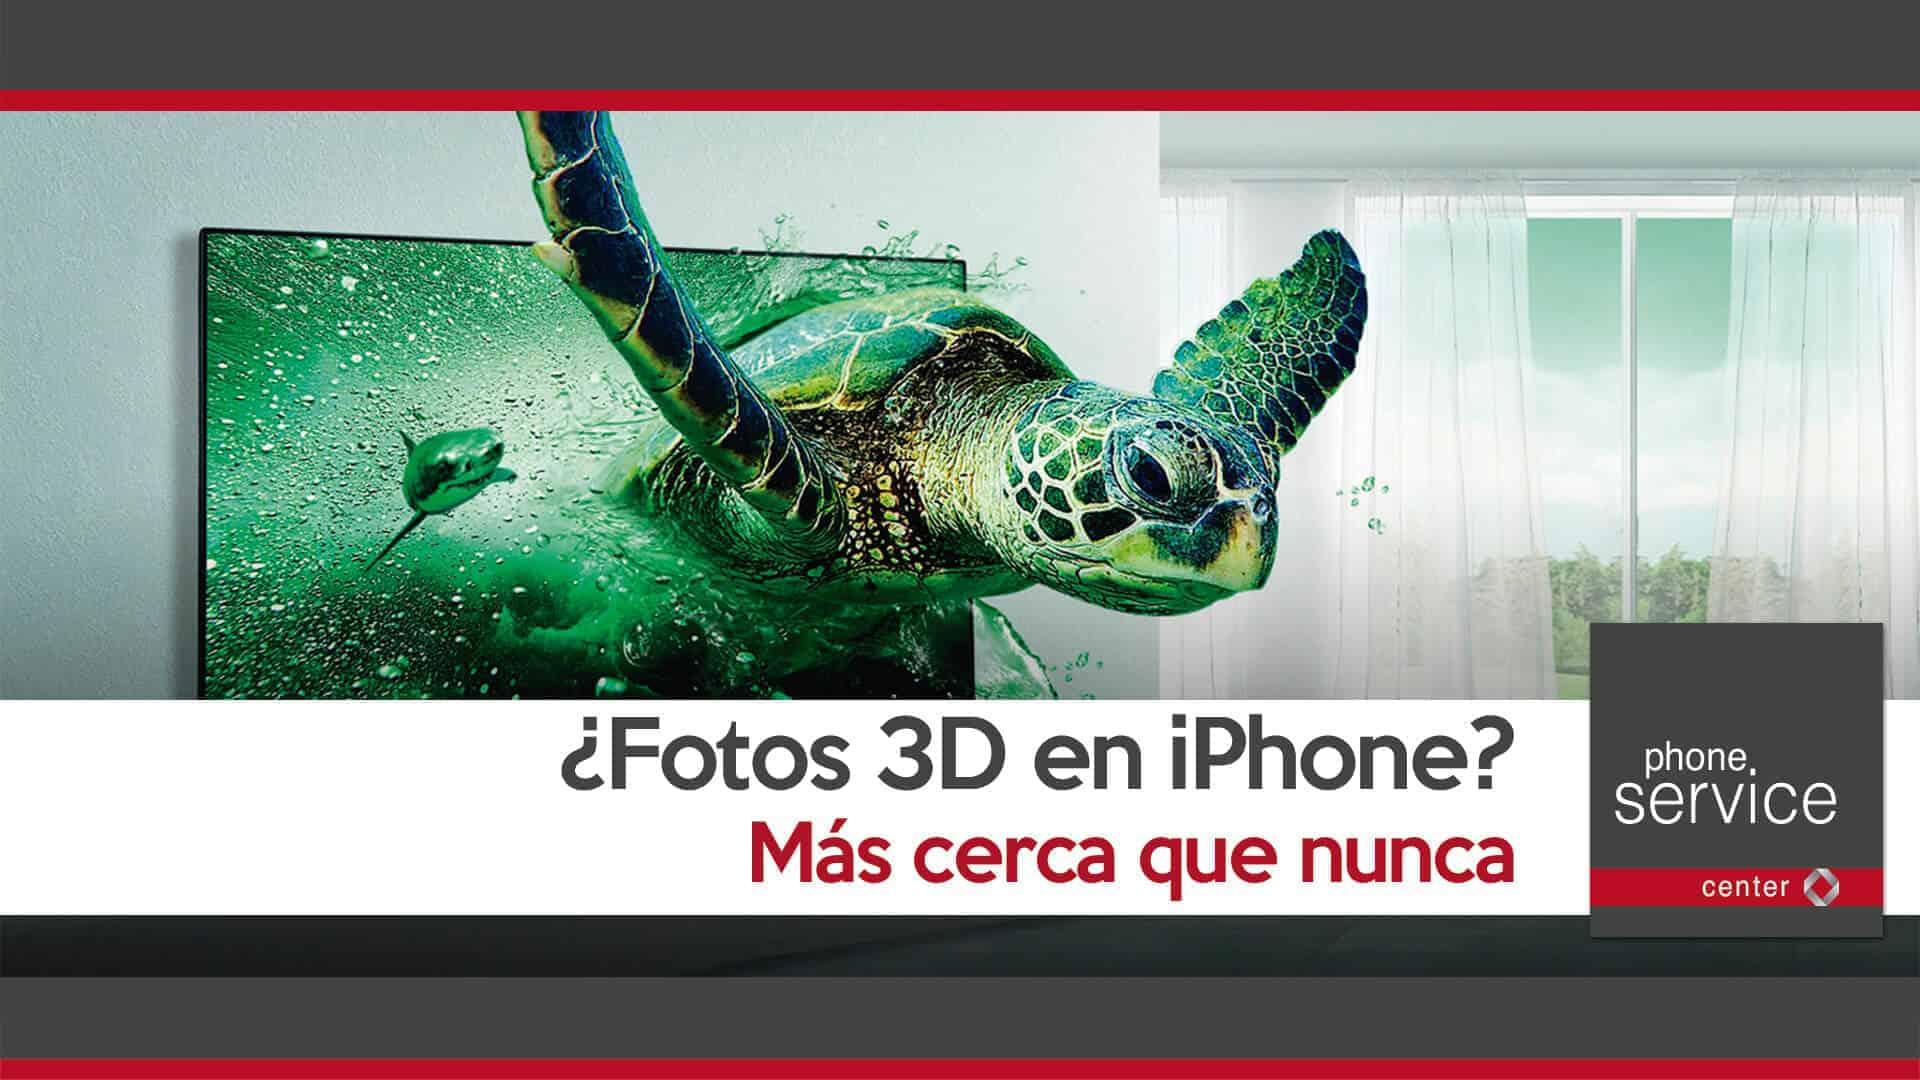 Fotografias 3D en iPhone